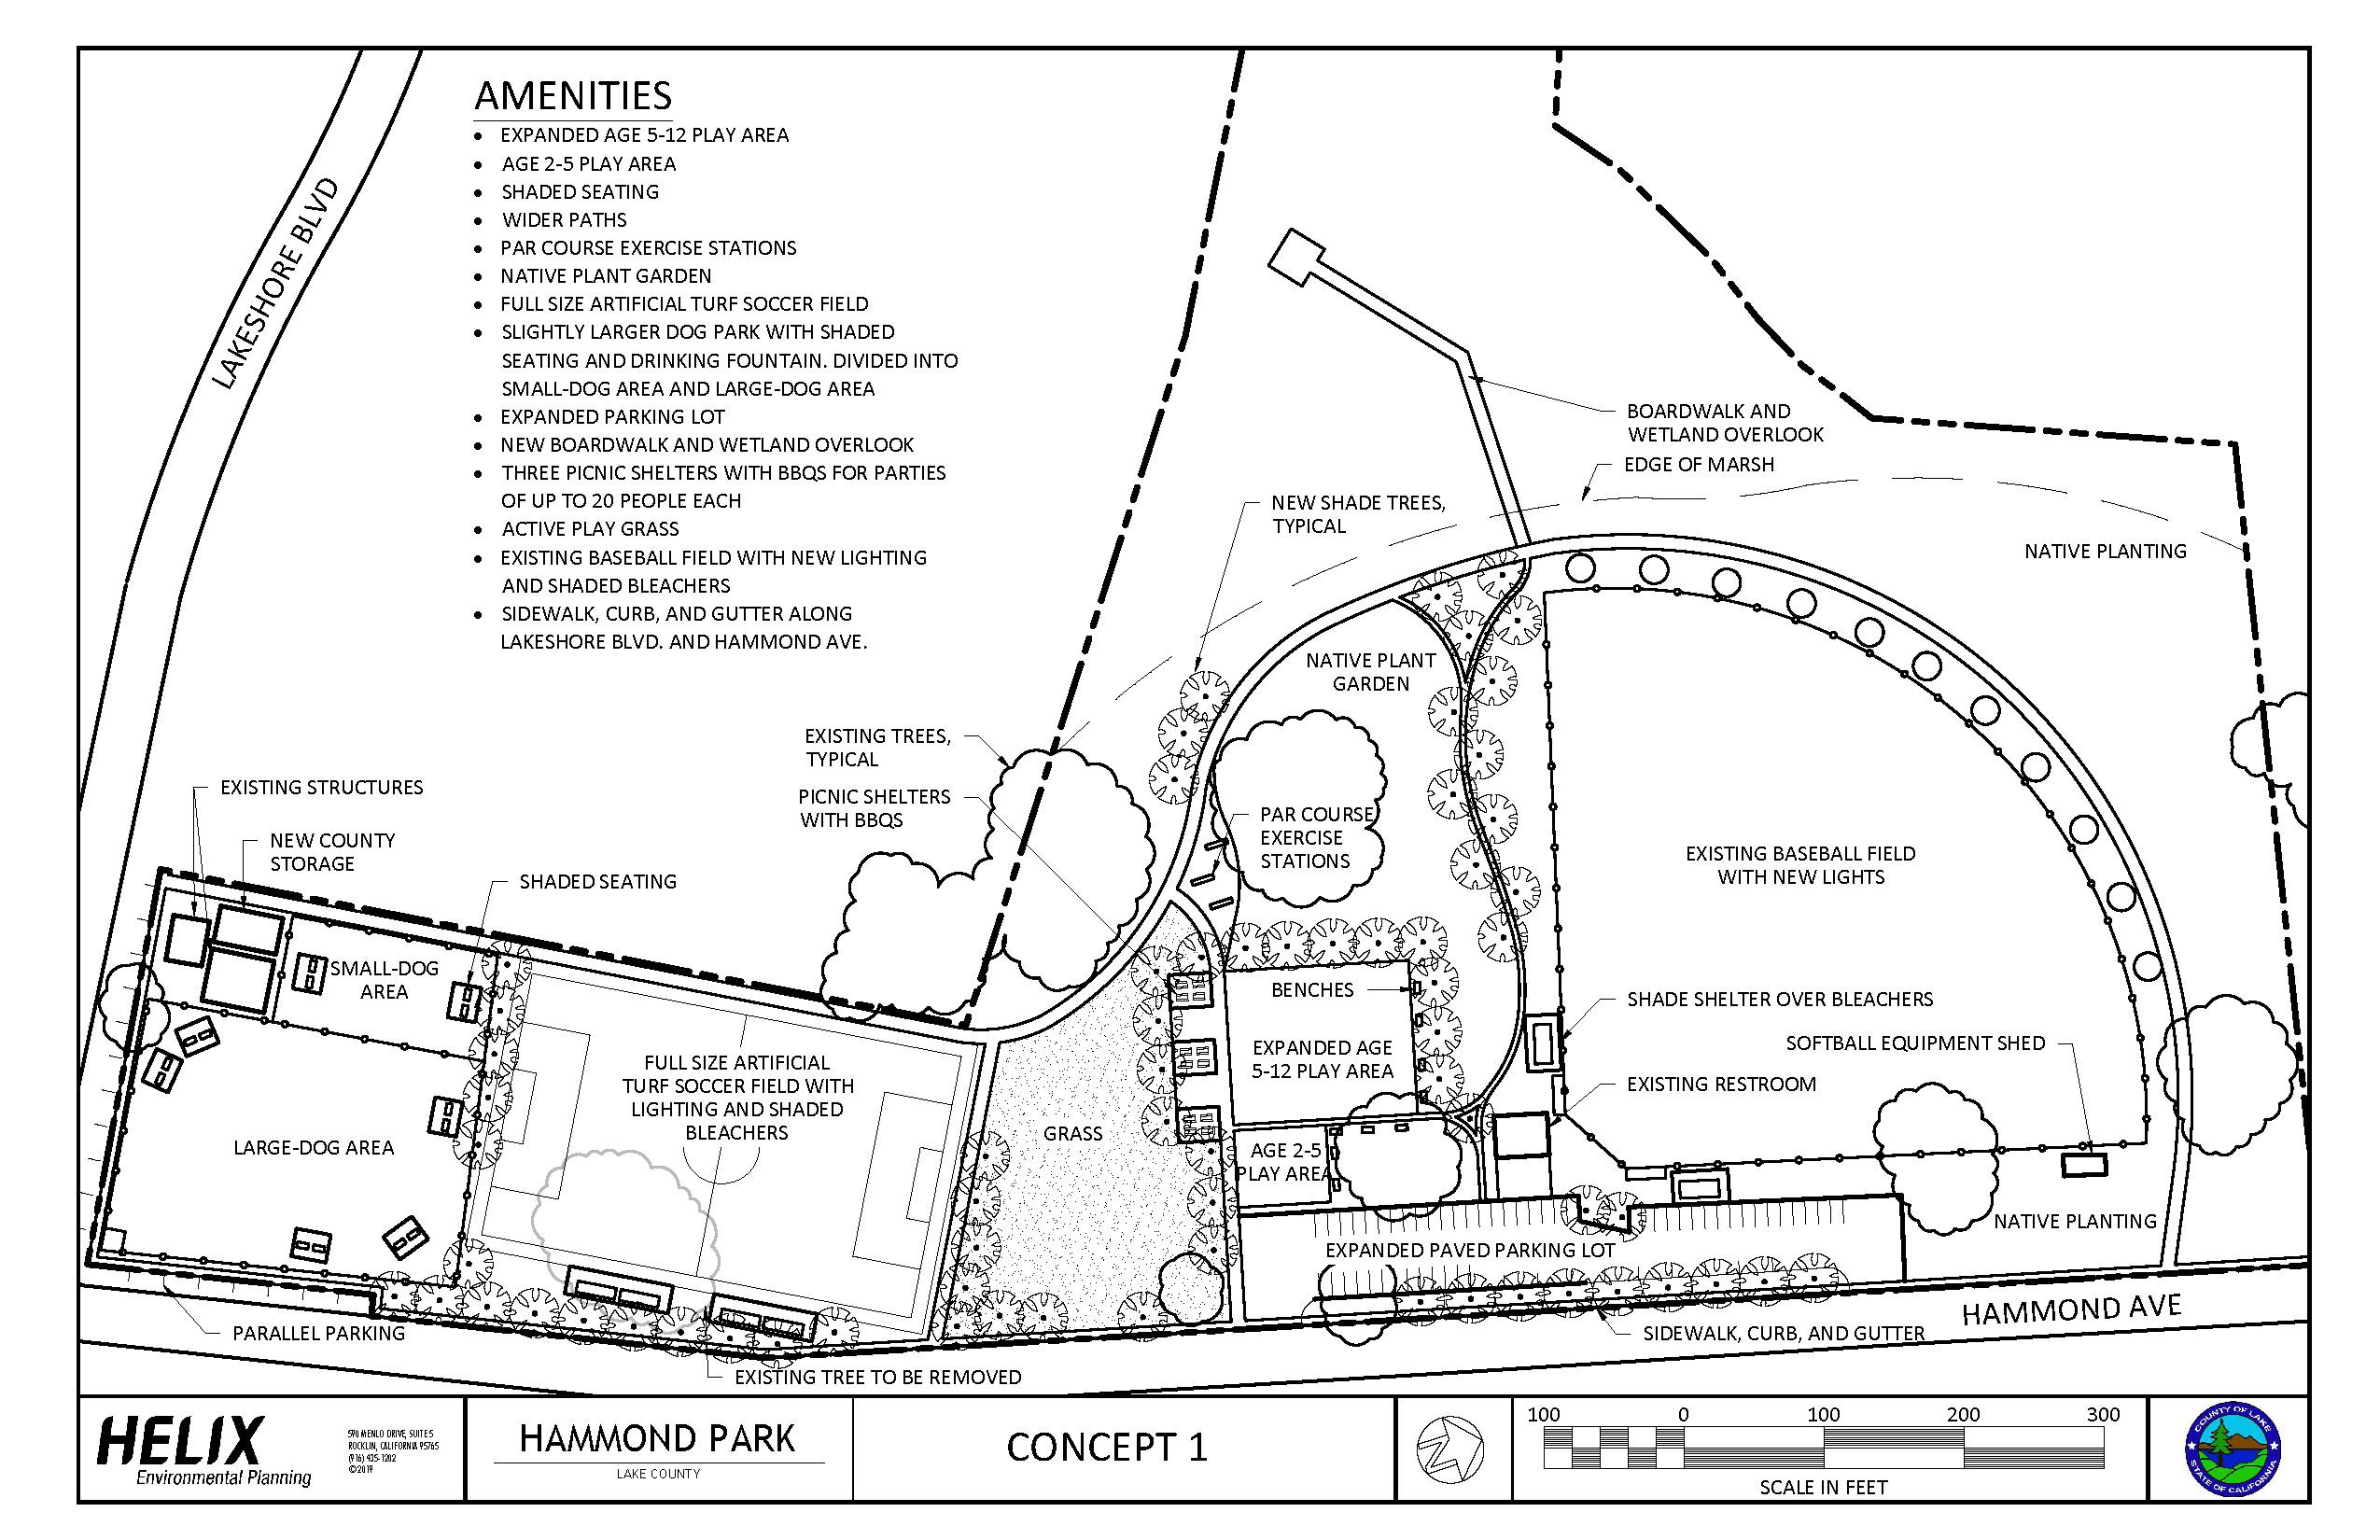 Hammond Park Concept 1